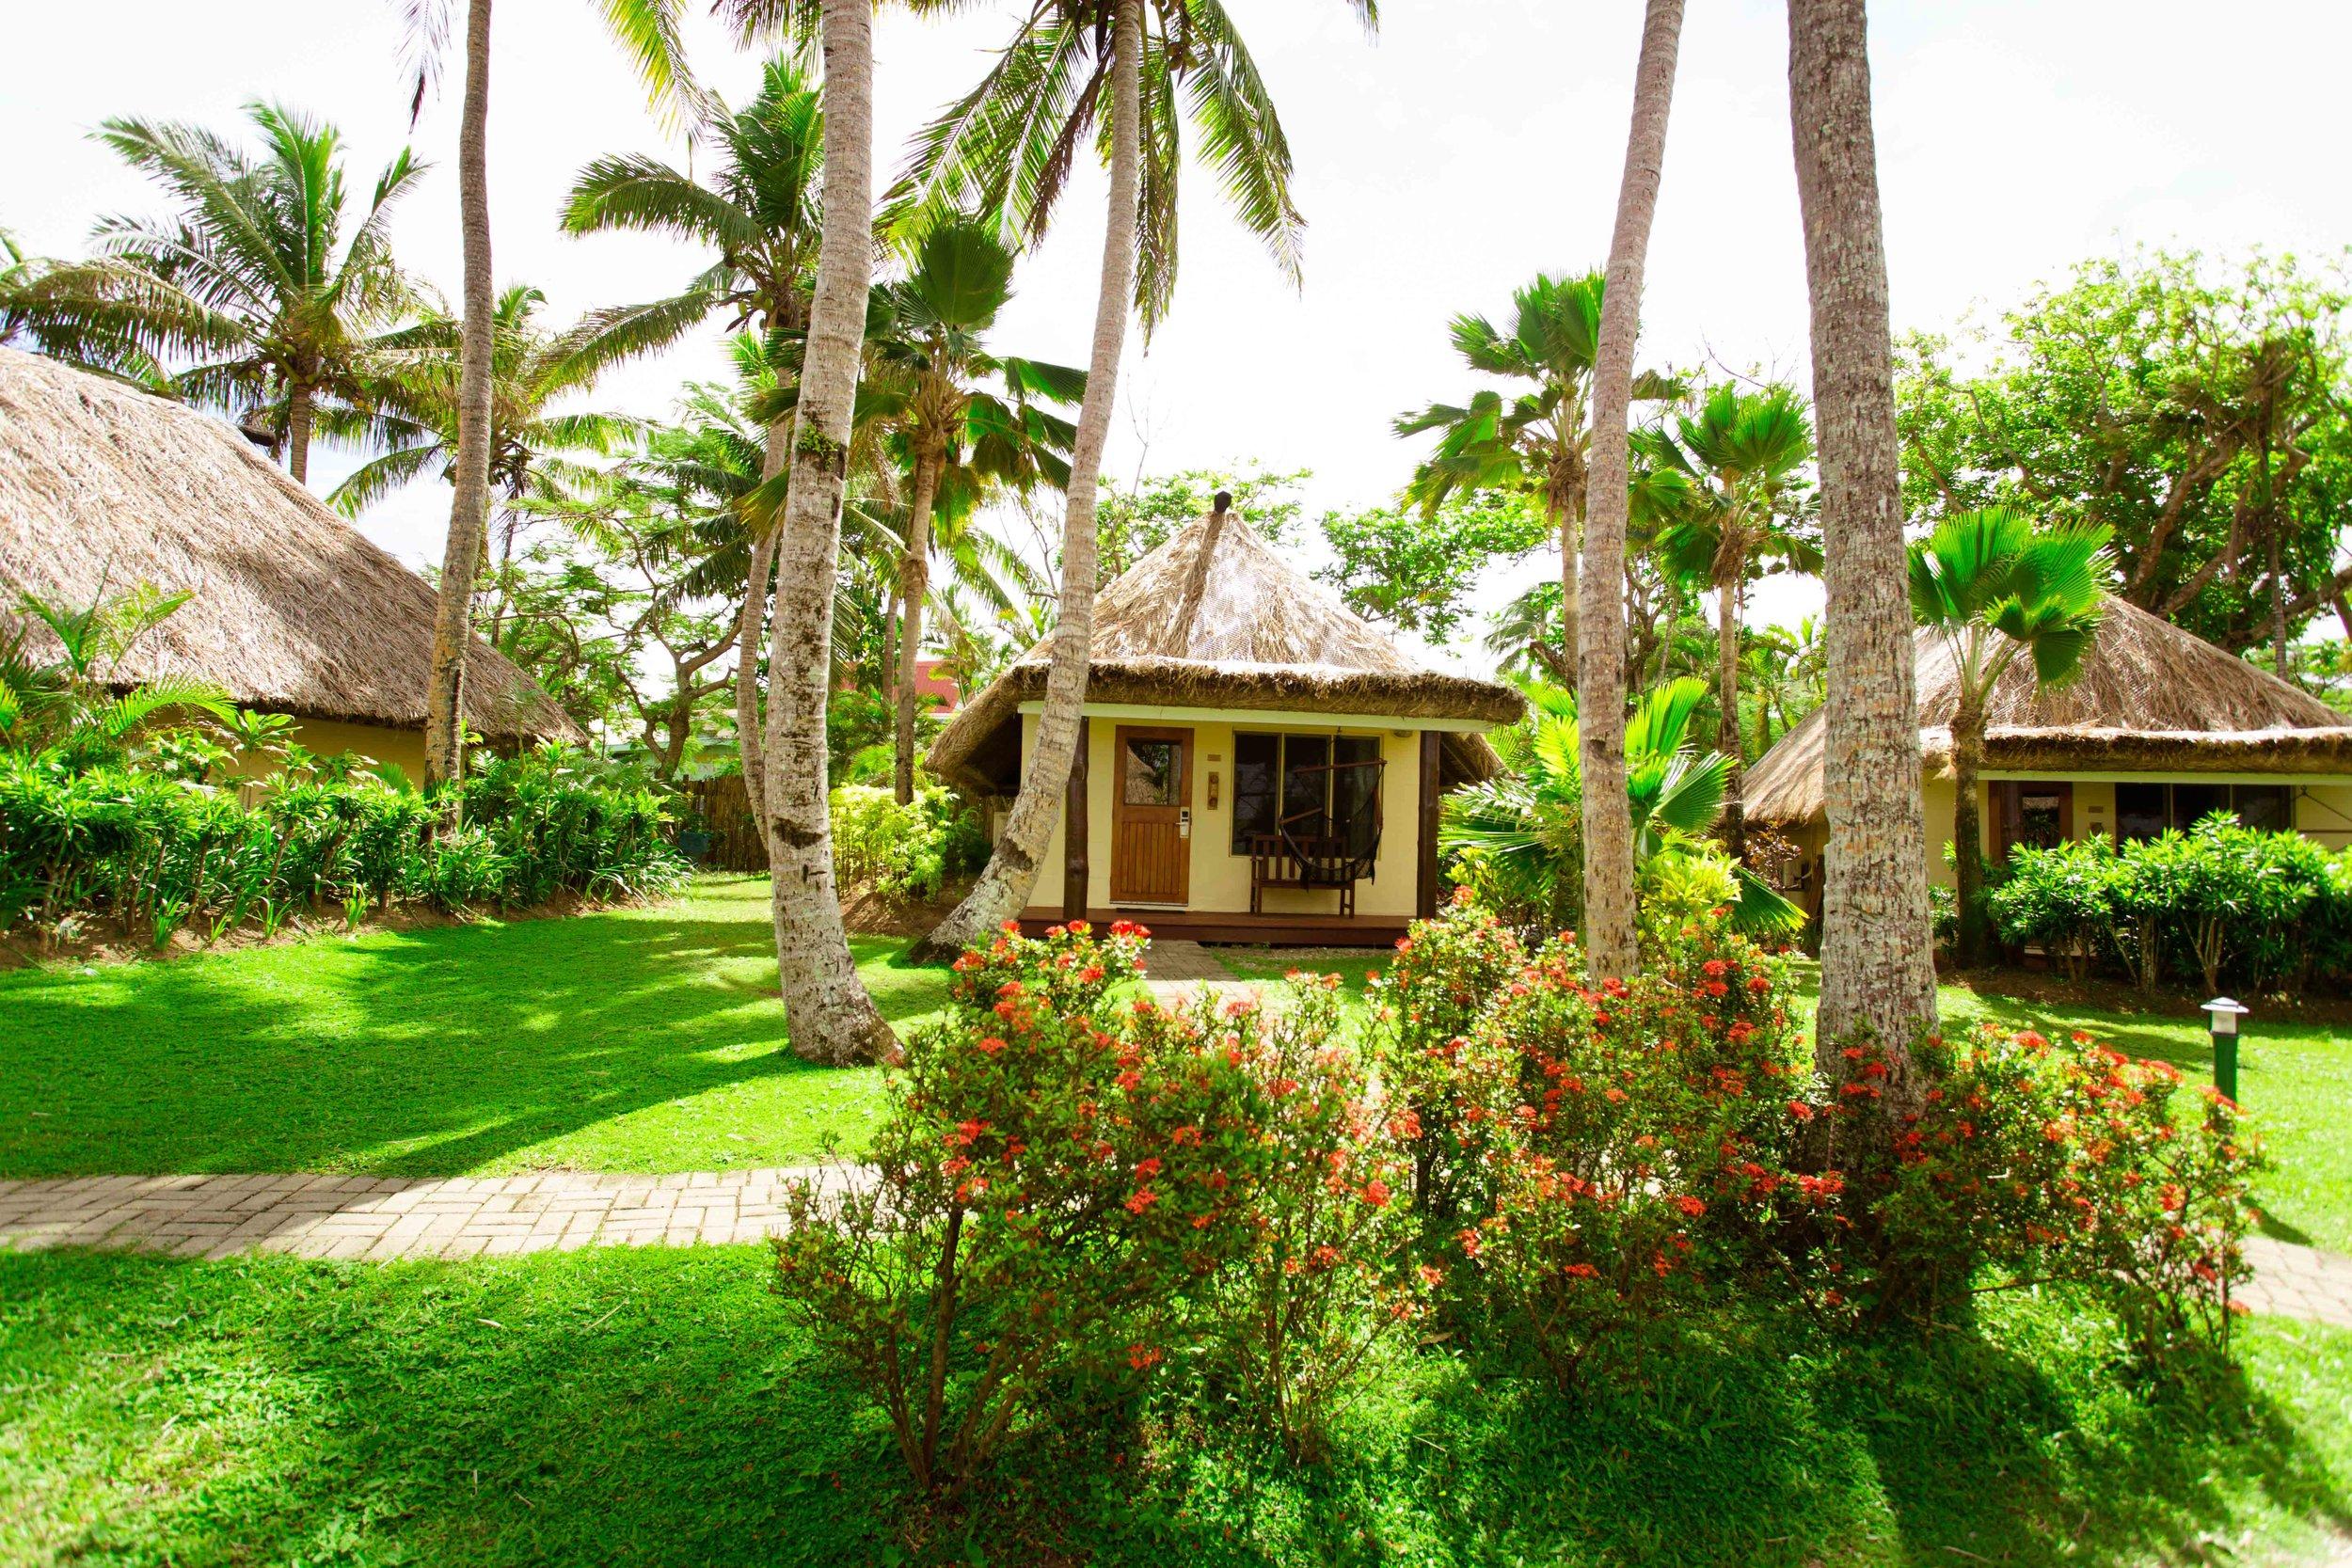 Hi_FOR_74365304_outrigger-fiji-beach-resort-ocean-breeze-bure3.jpg